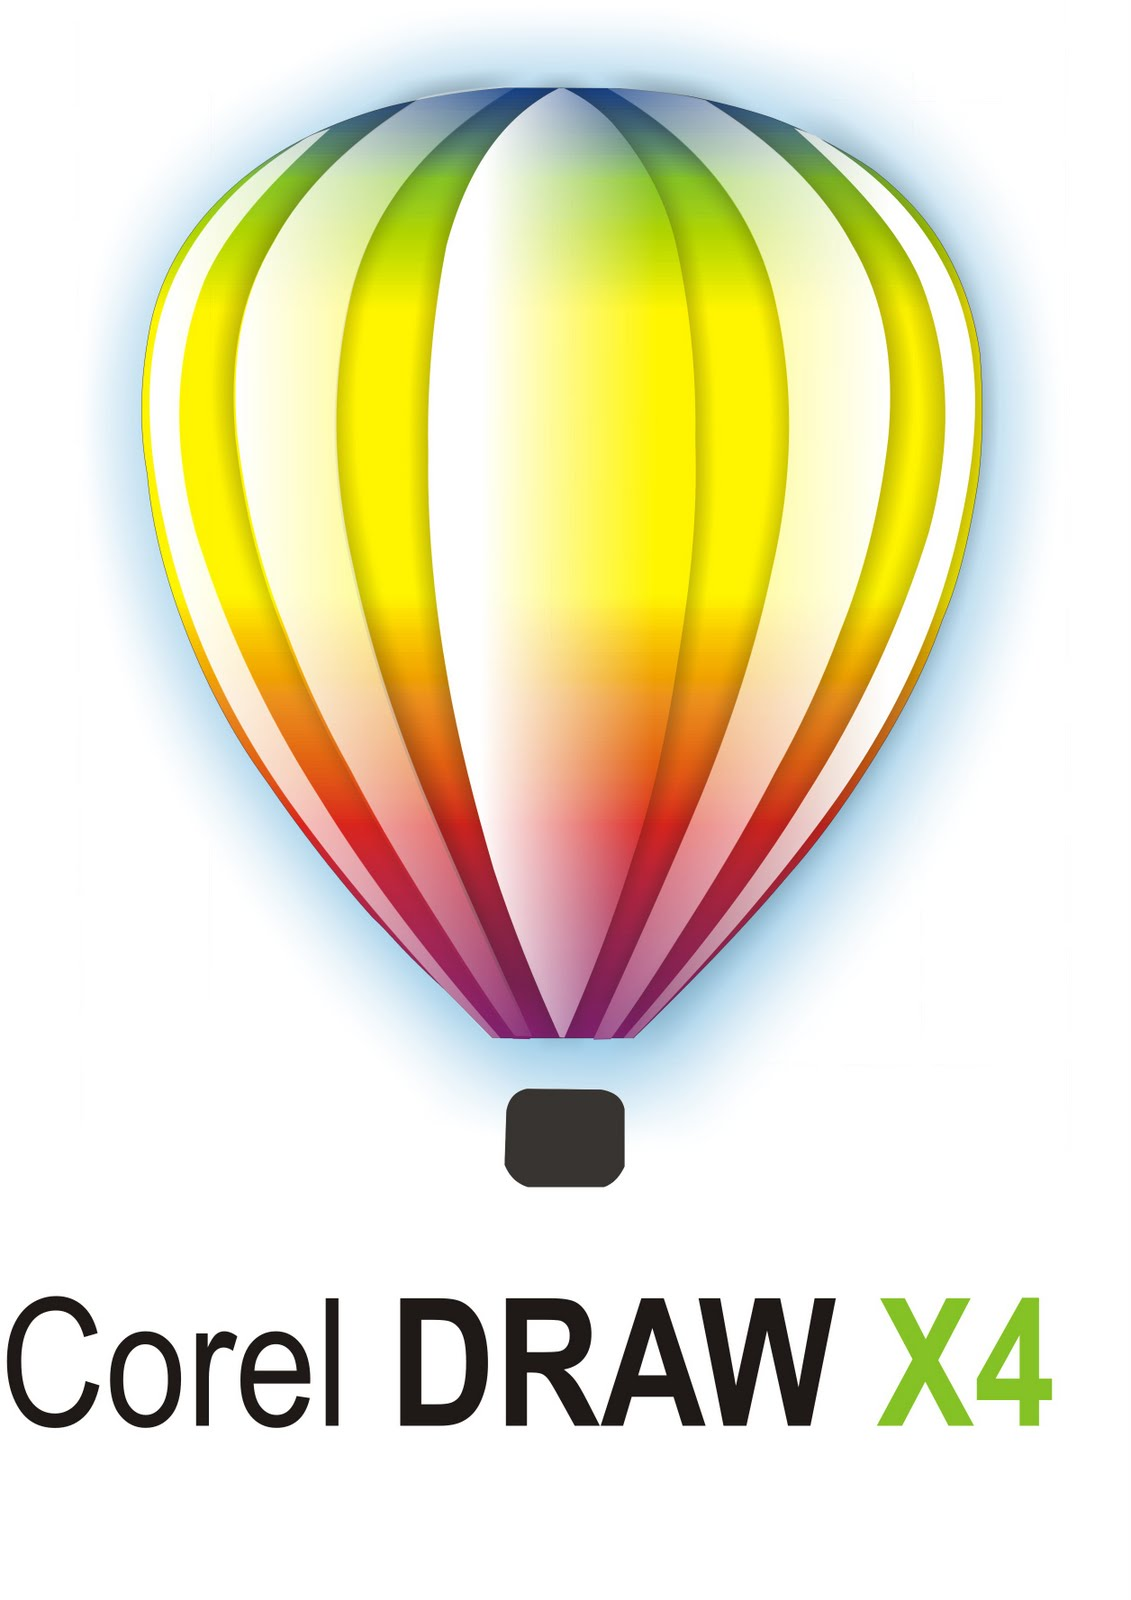 Corel draw logo x4 icon #5677.